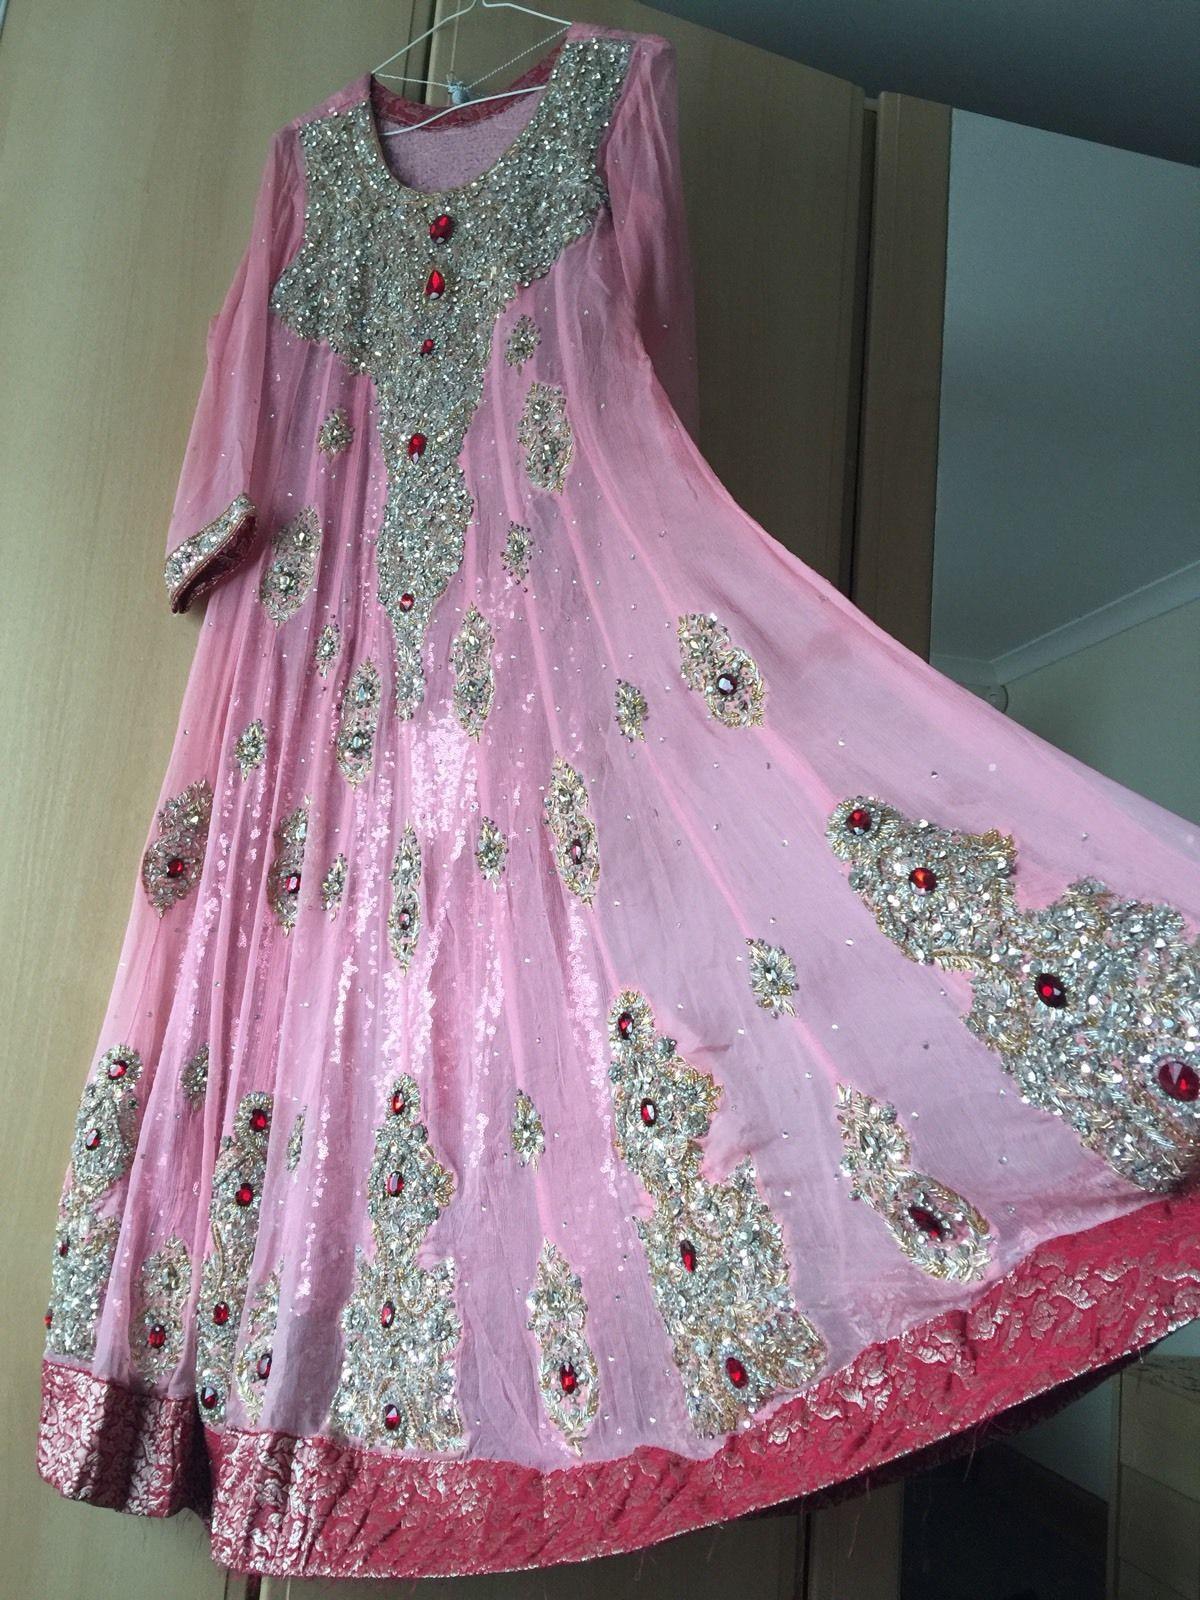 c25360a7a992 Ladies Asian Indian Pakistani Anarkali Wedding Boutique Designer ...